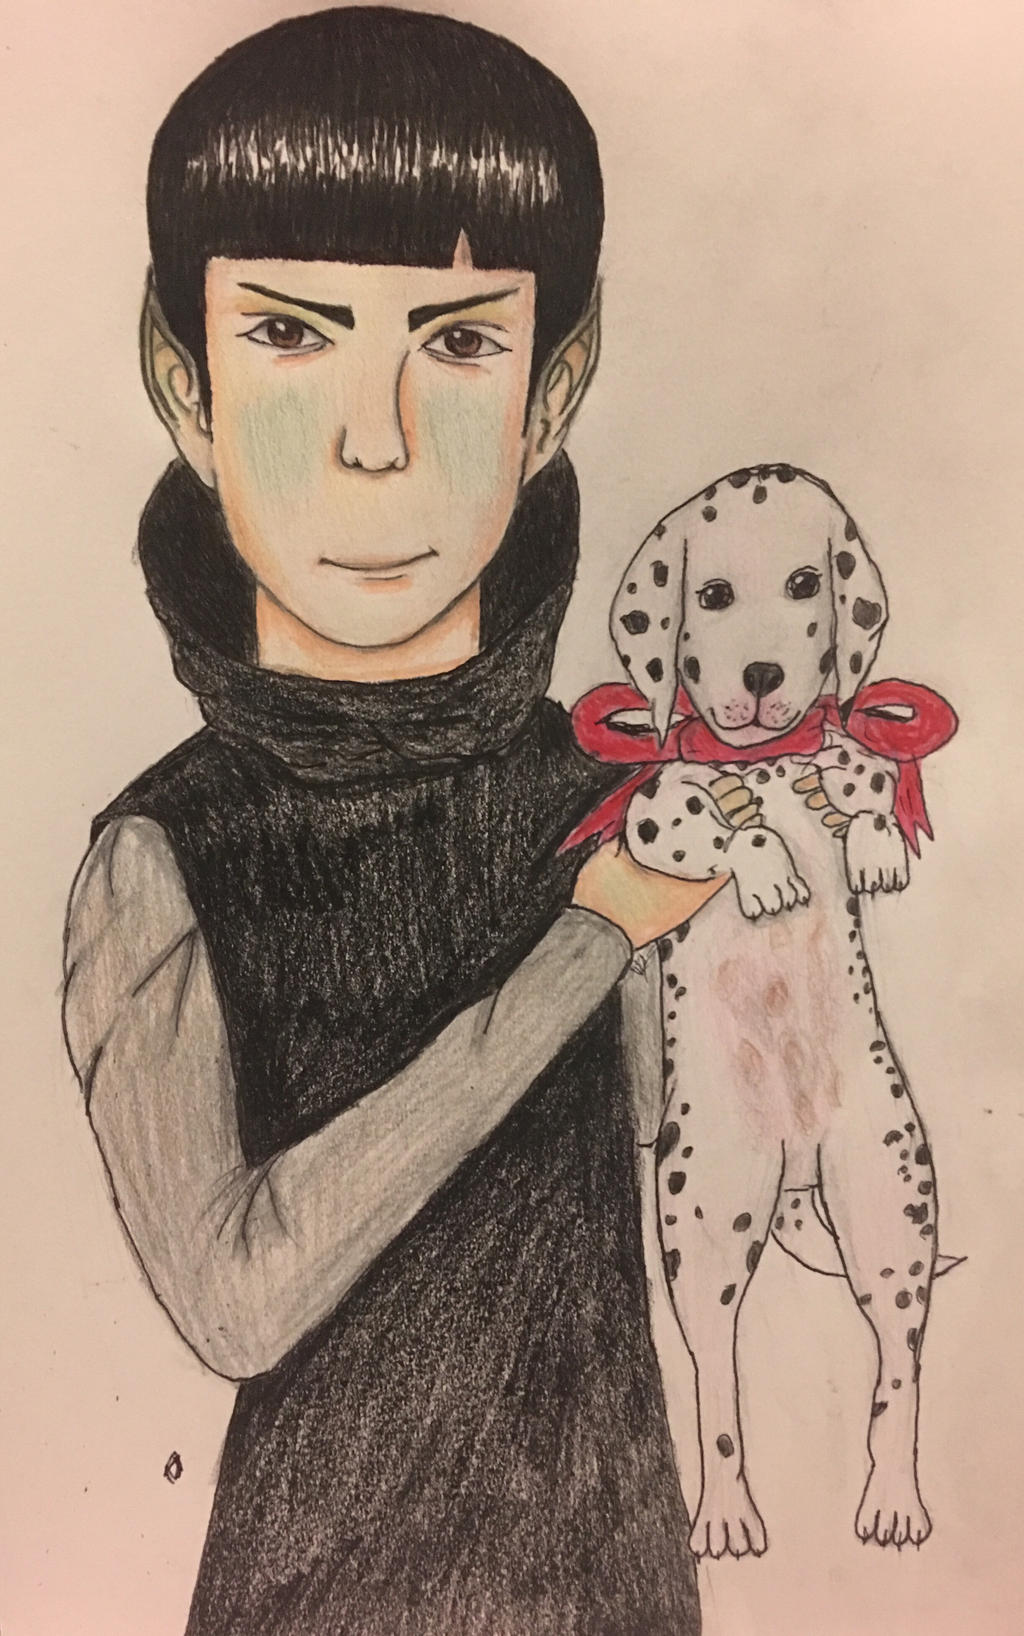 Spock and his Dalmatian Oscar by ChuckyAndy